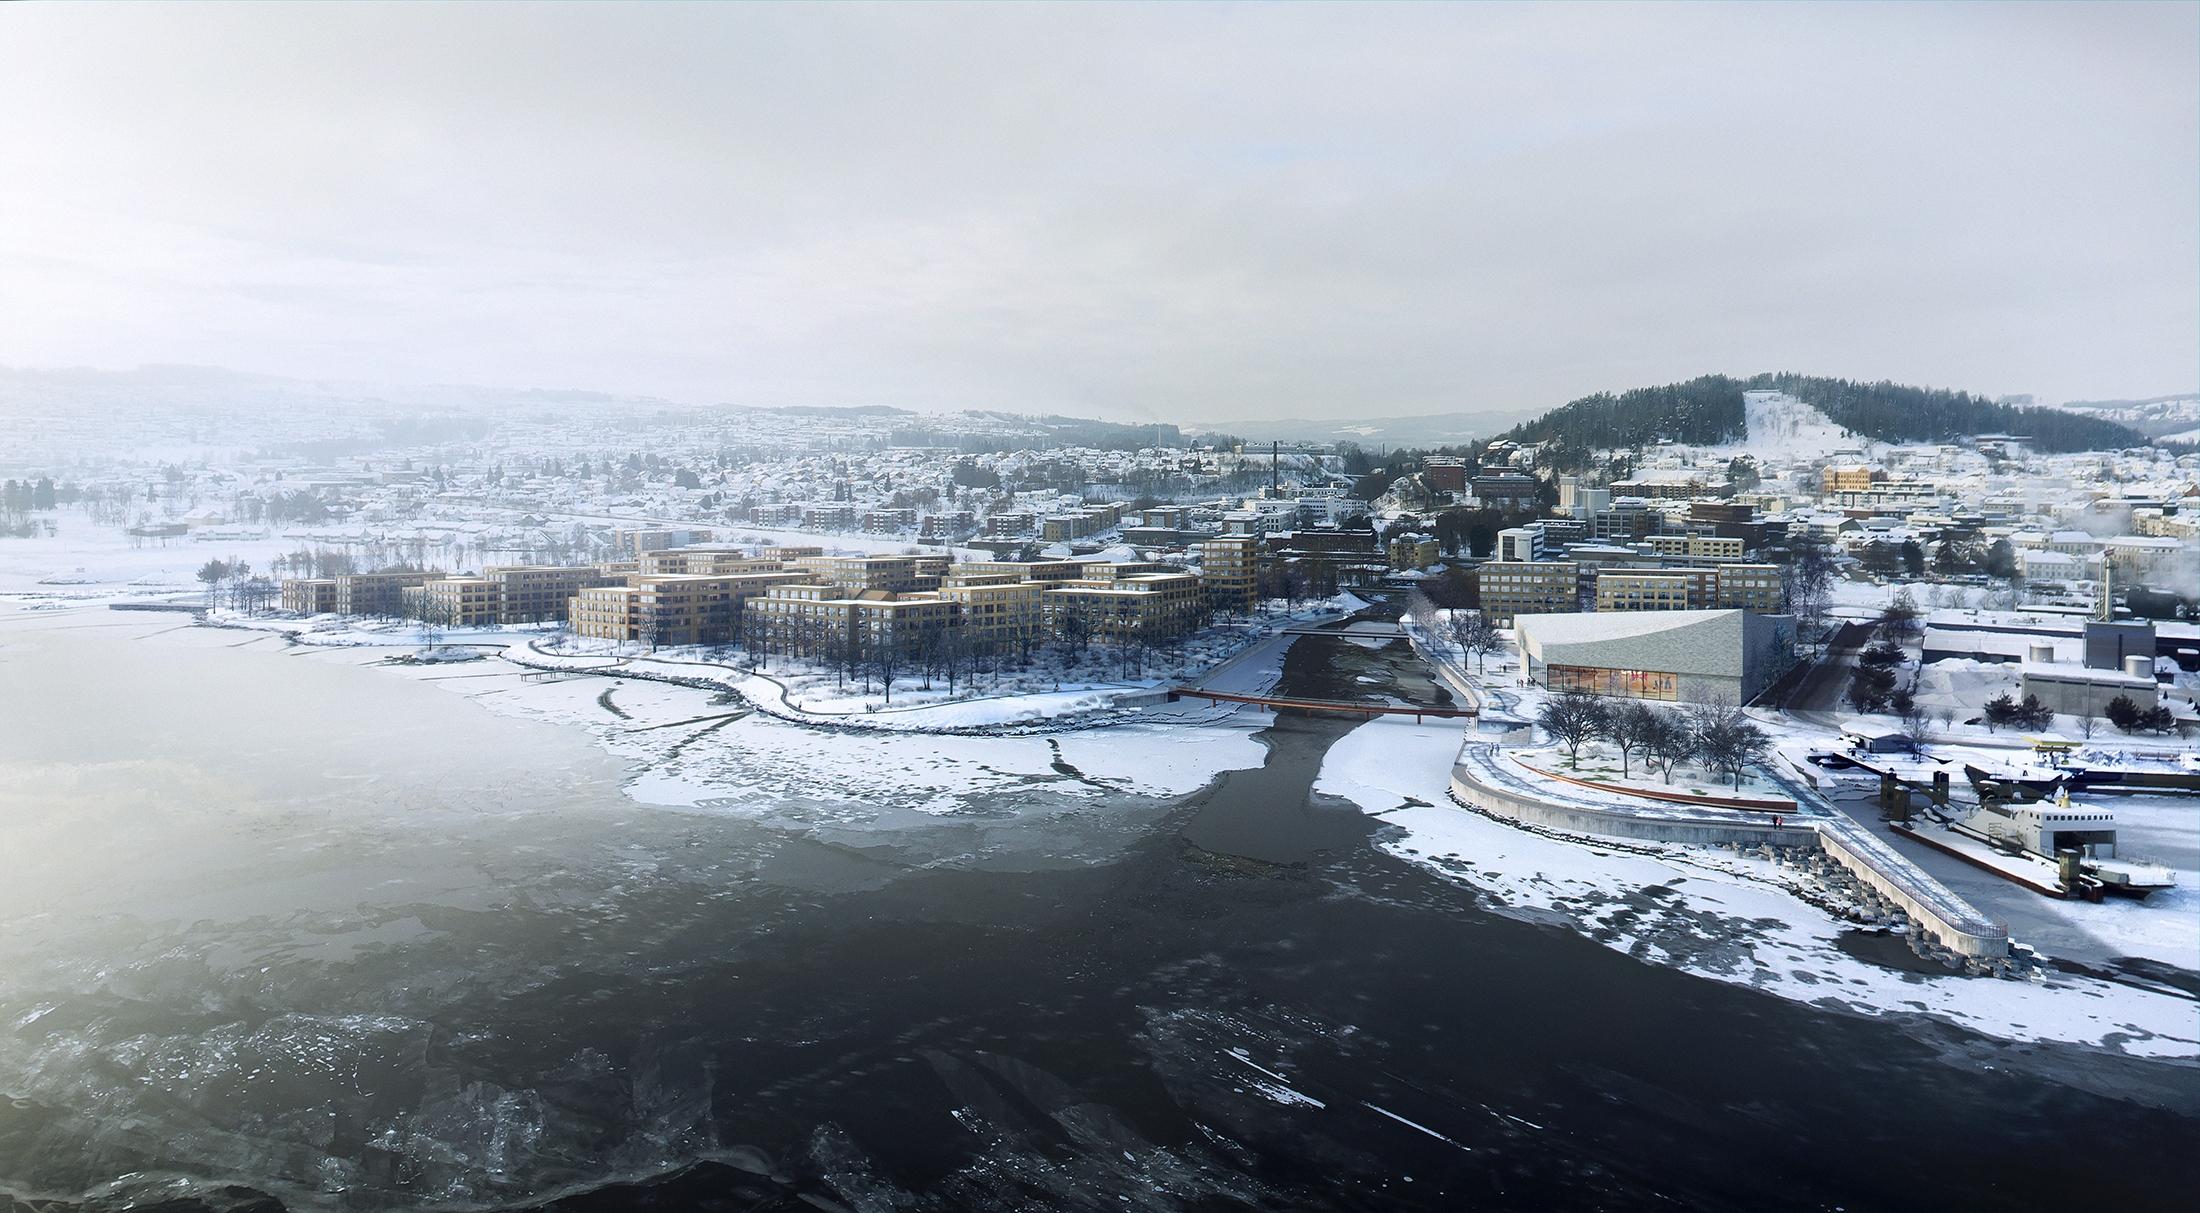 Koht, Gjovik, Norway, 2017